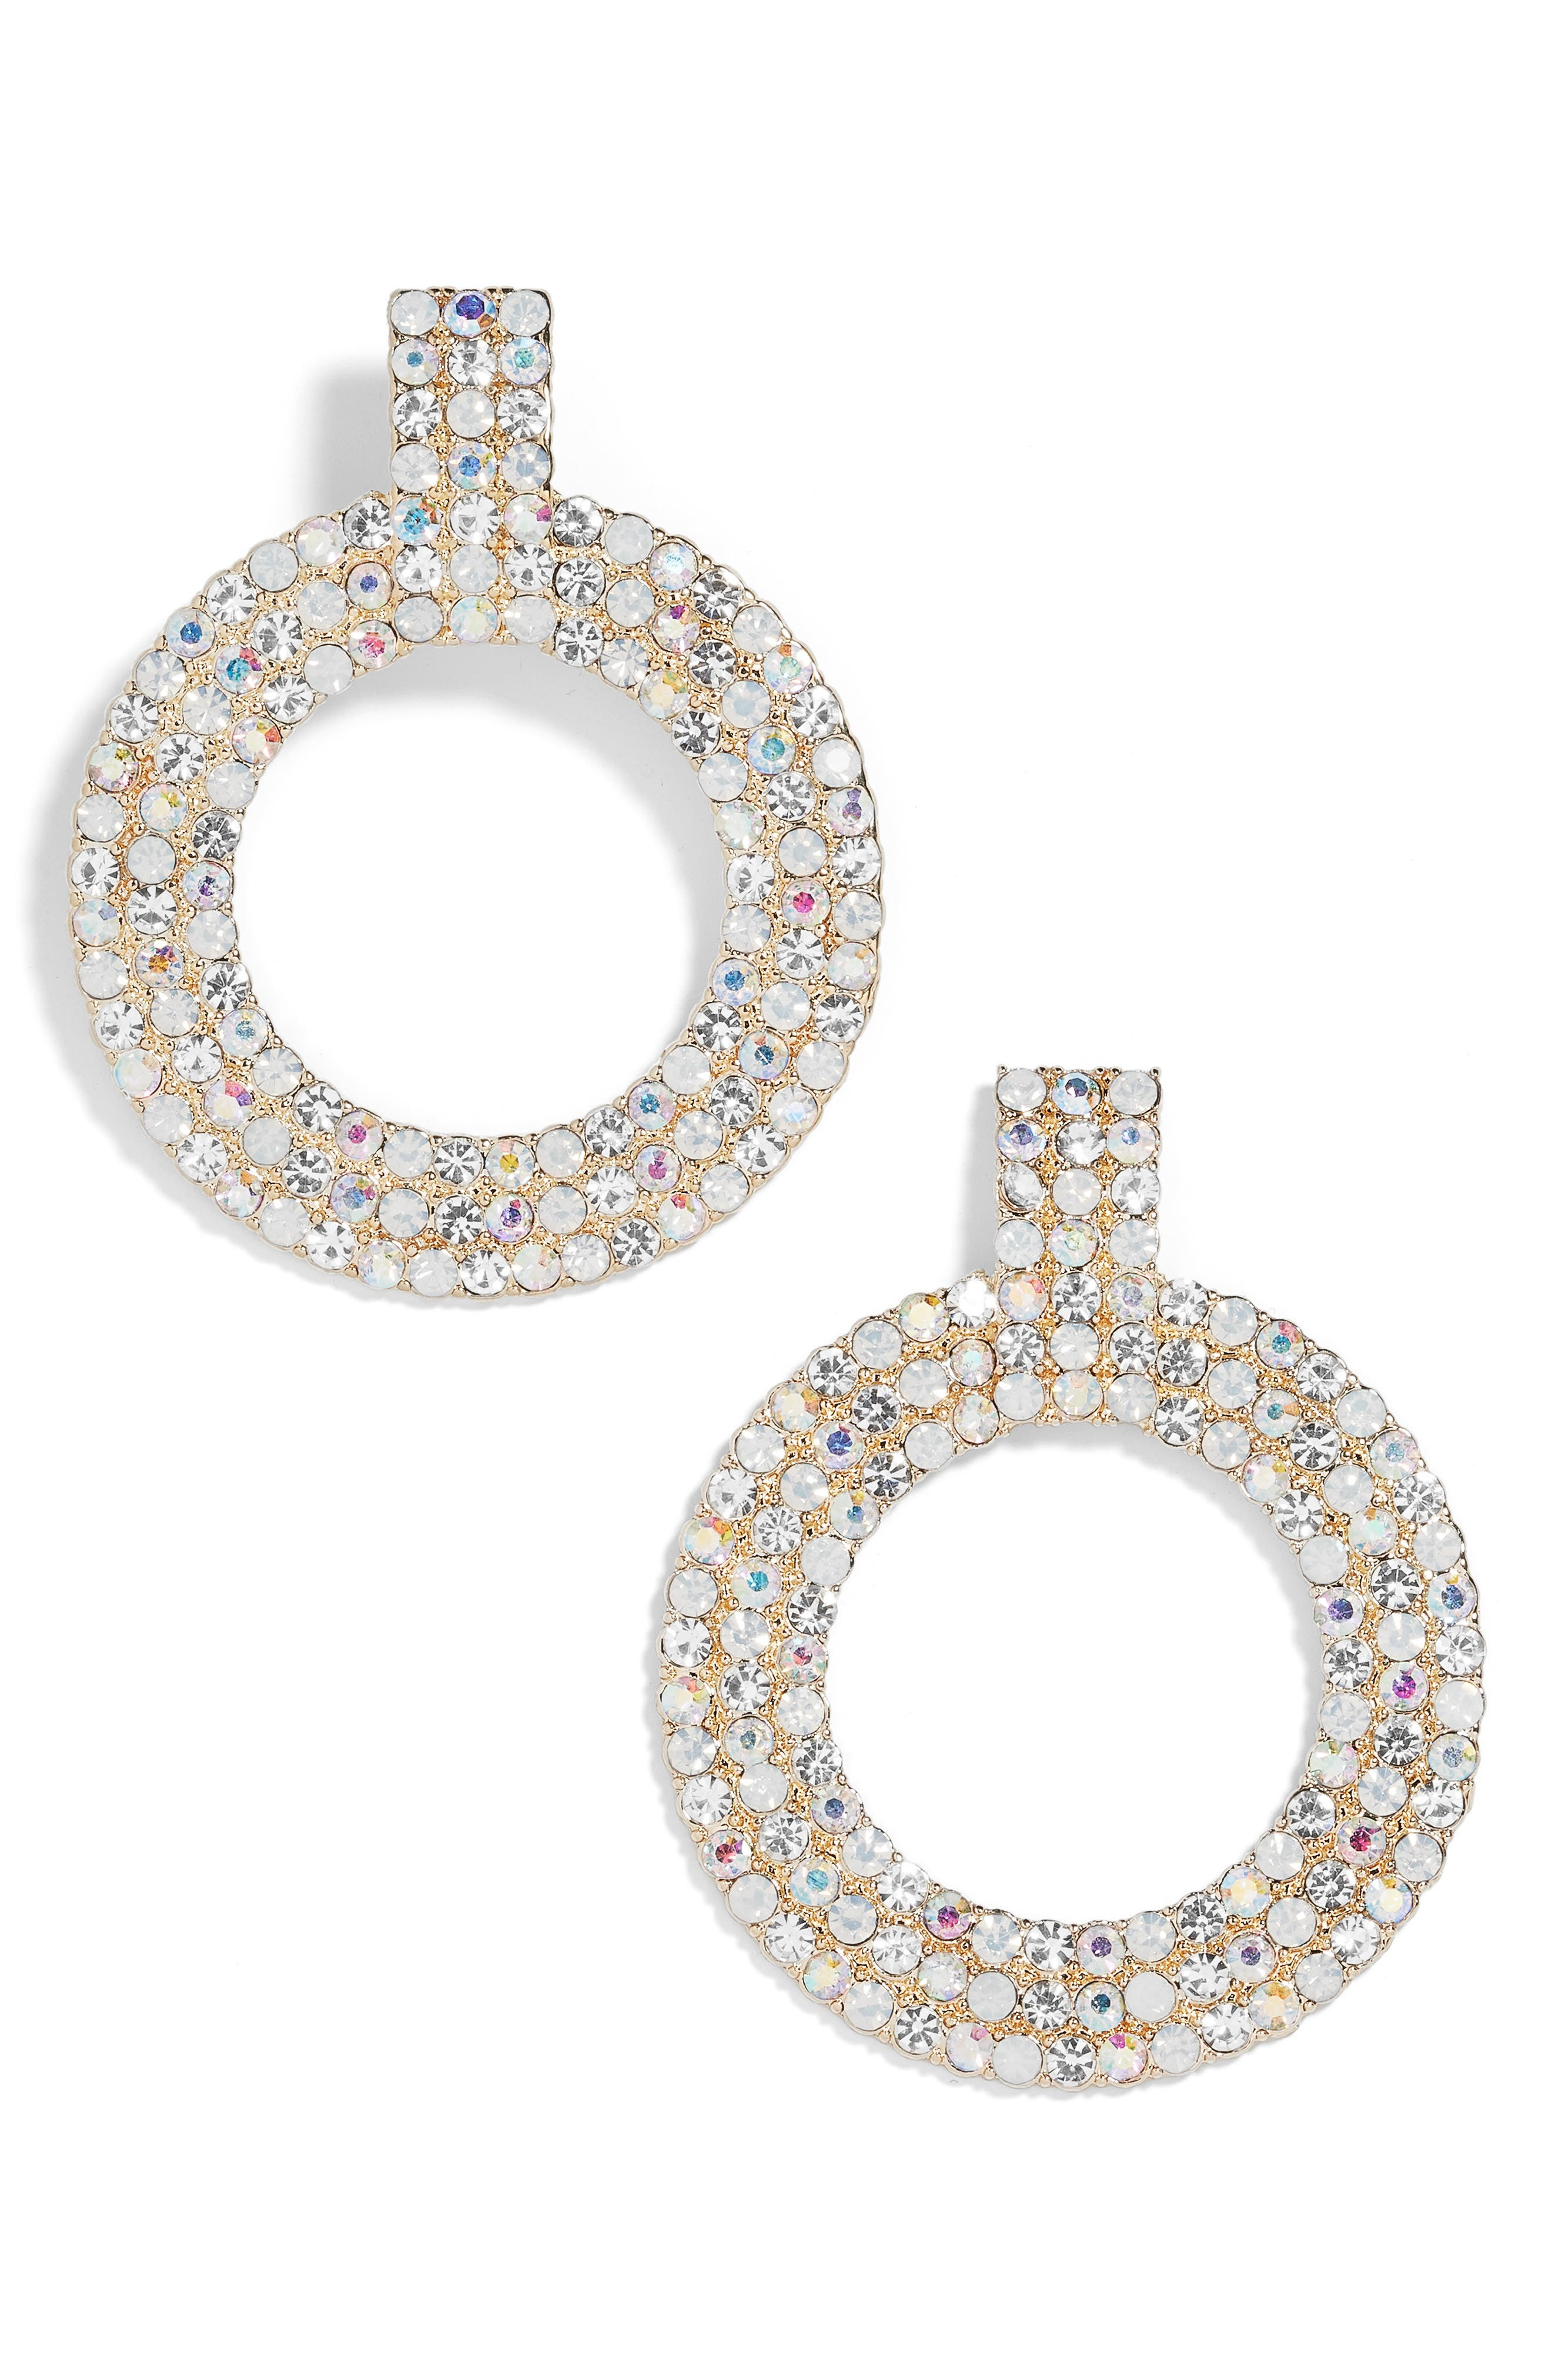 Adonia Pavé Hoop Earrings,                             Main thumbnail 1, color,                             CLEAR/ OPAL